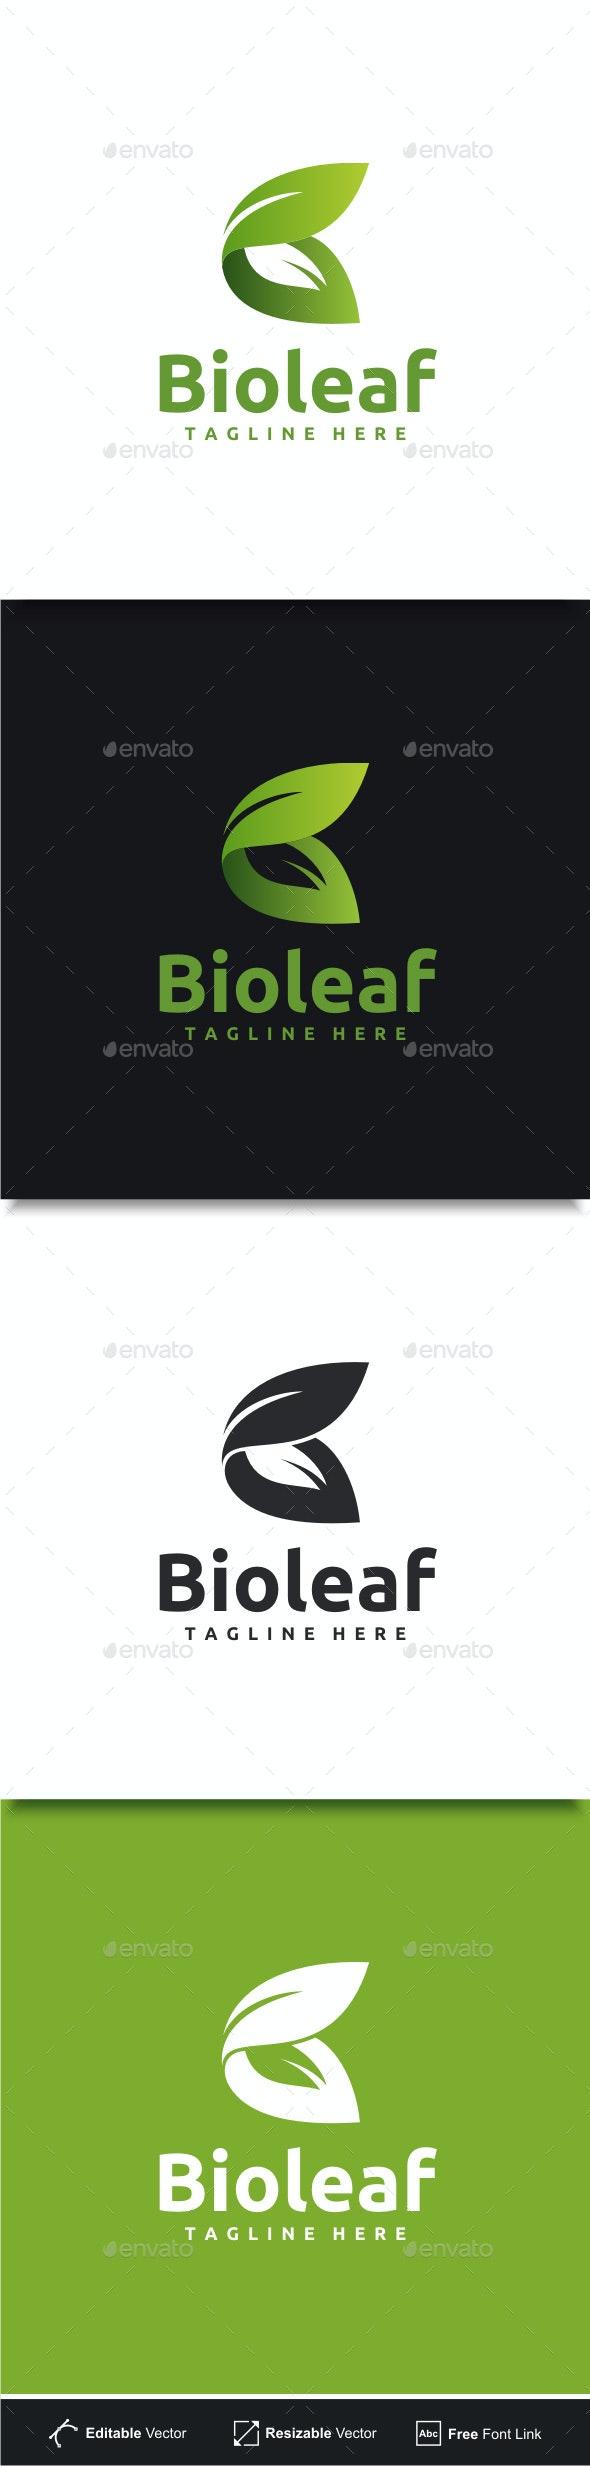 Bio Leaf - Letter B Logo - Nature Logo Templates